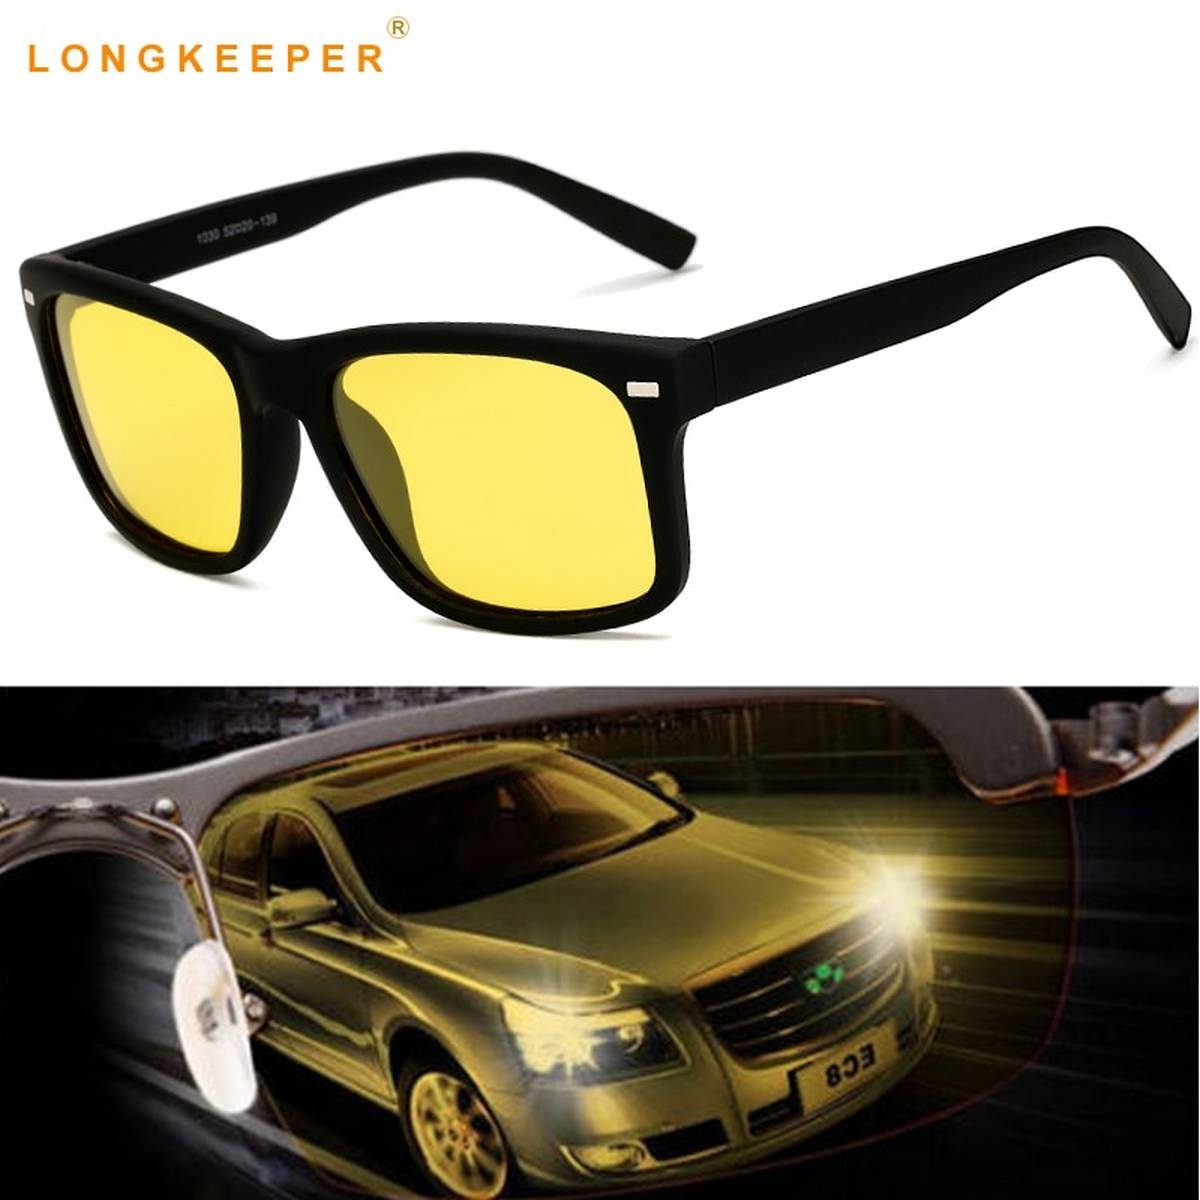 Trendy New Design Yellow Sunglasses- Metal Frame For Unisex